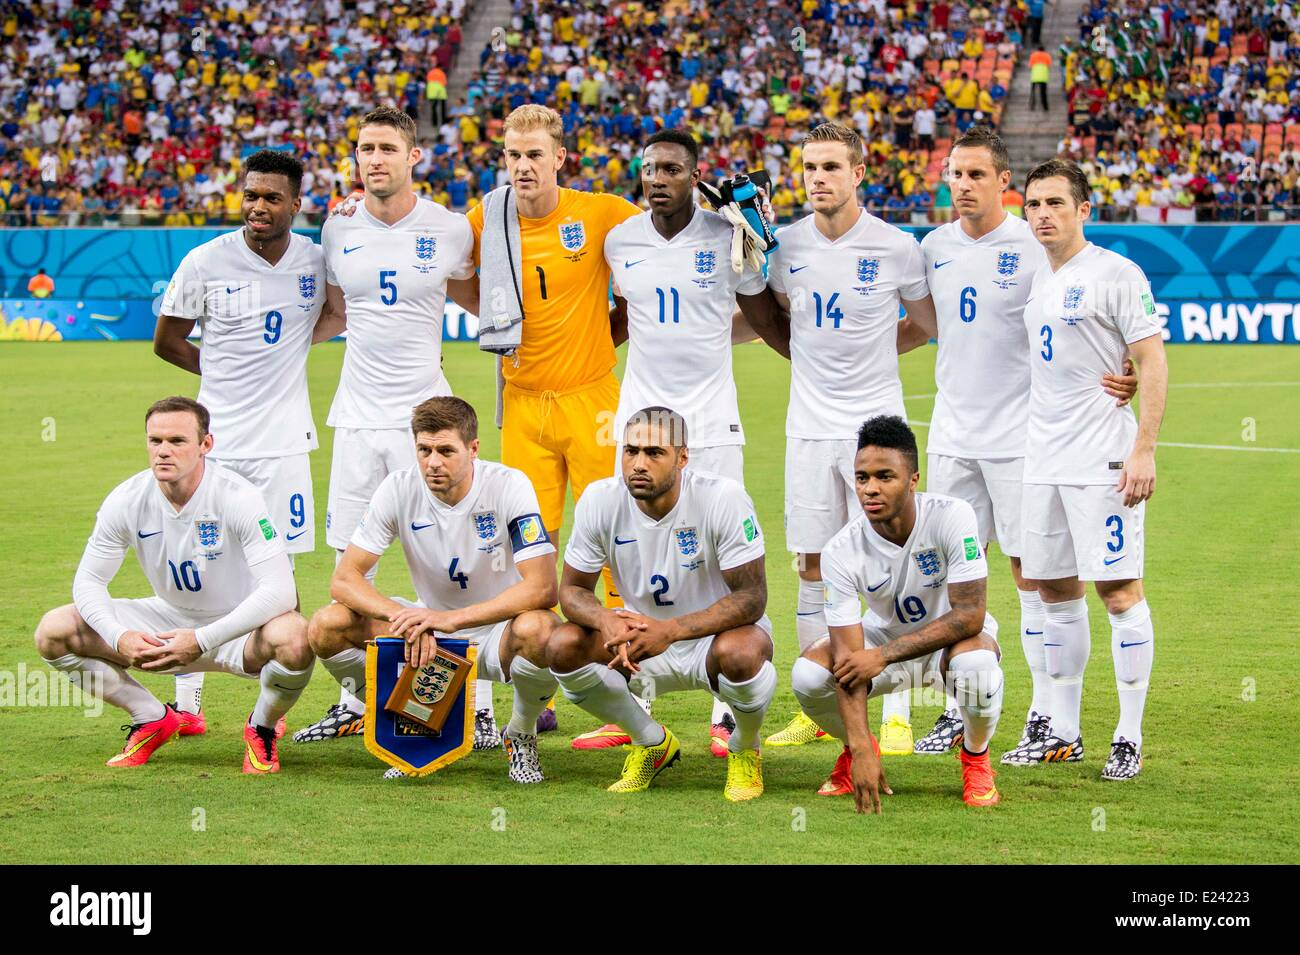 England football team 2014 world cup logo